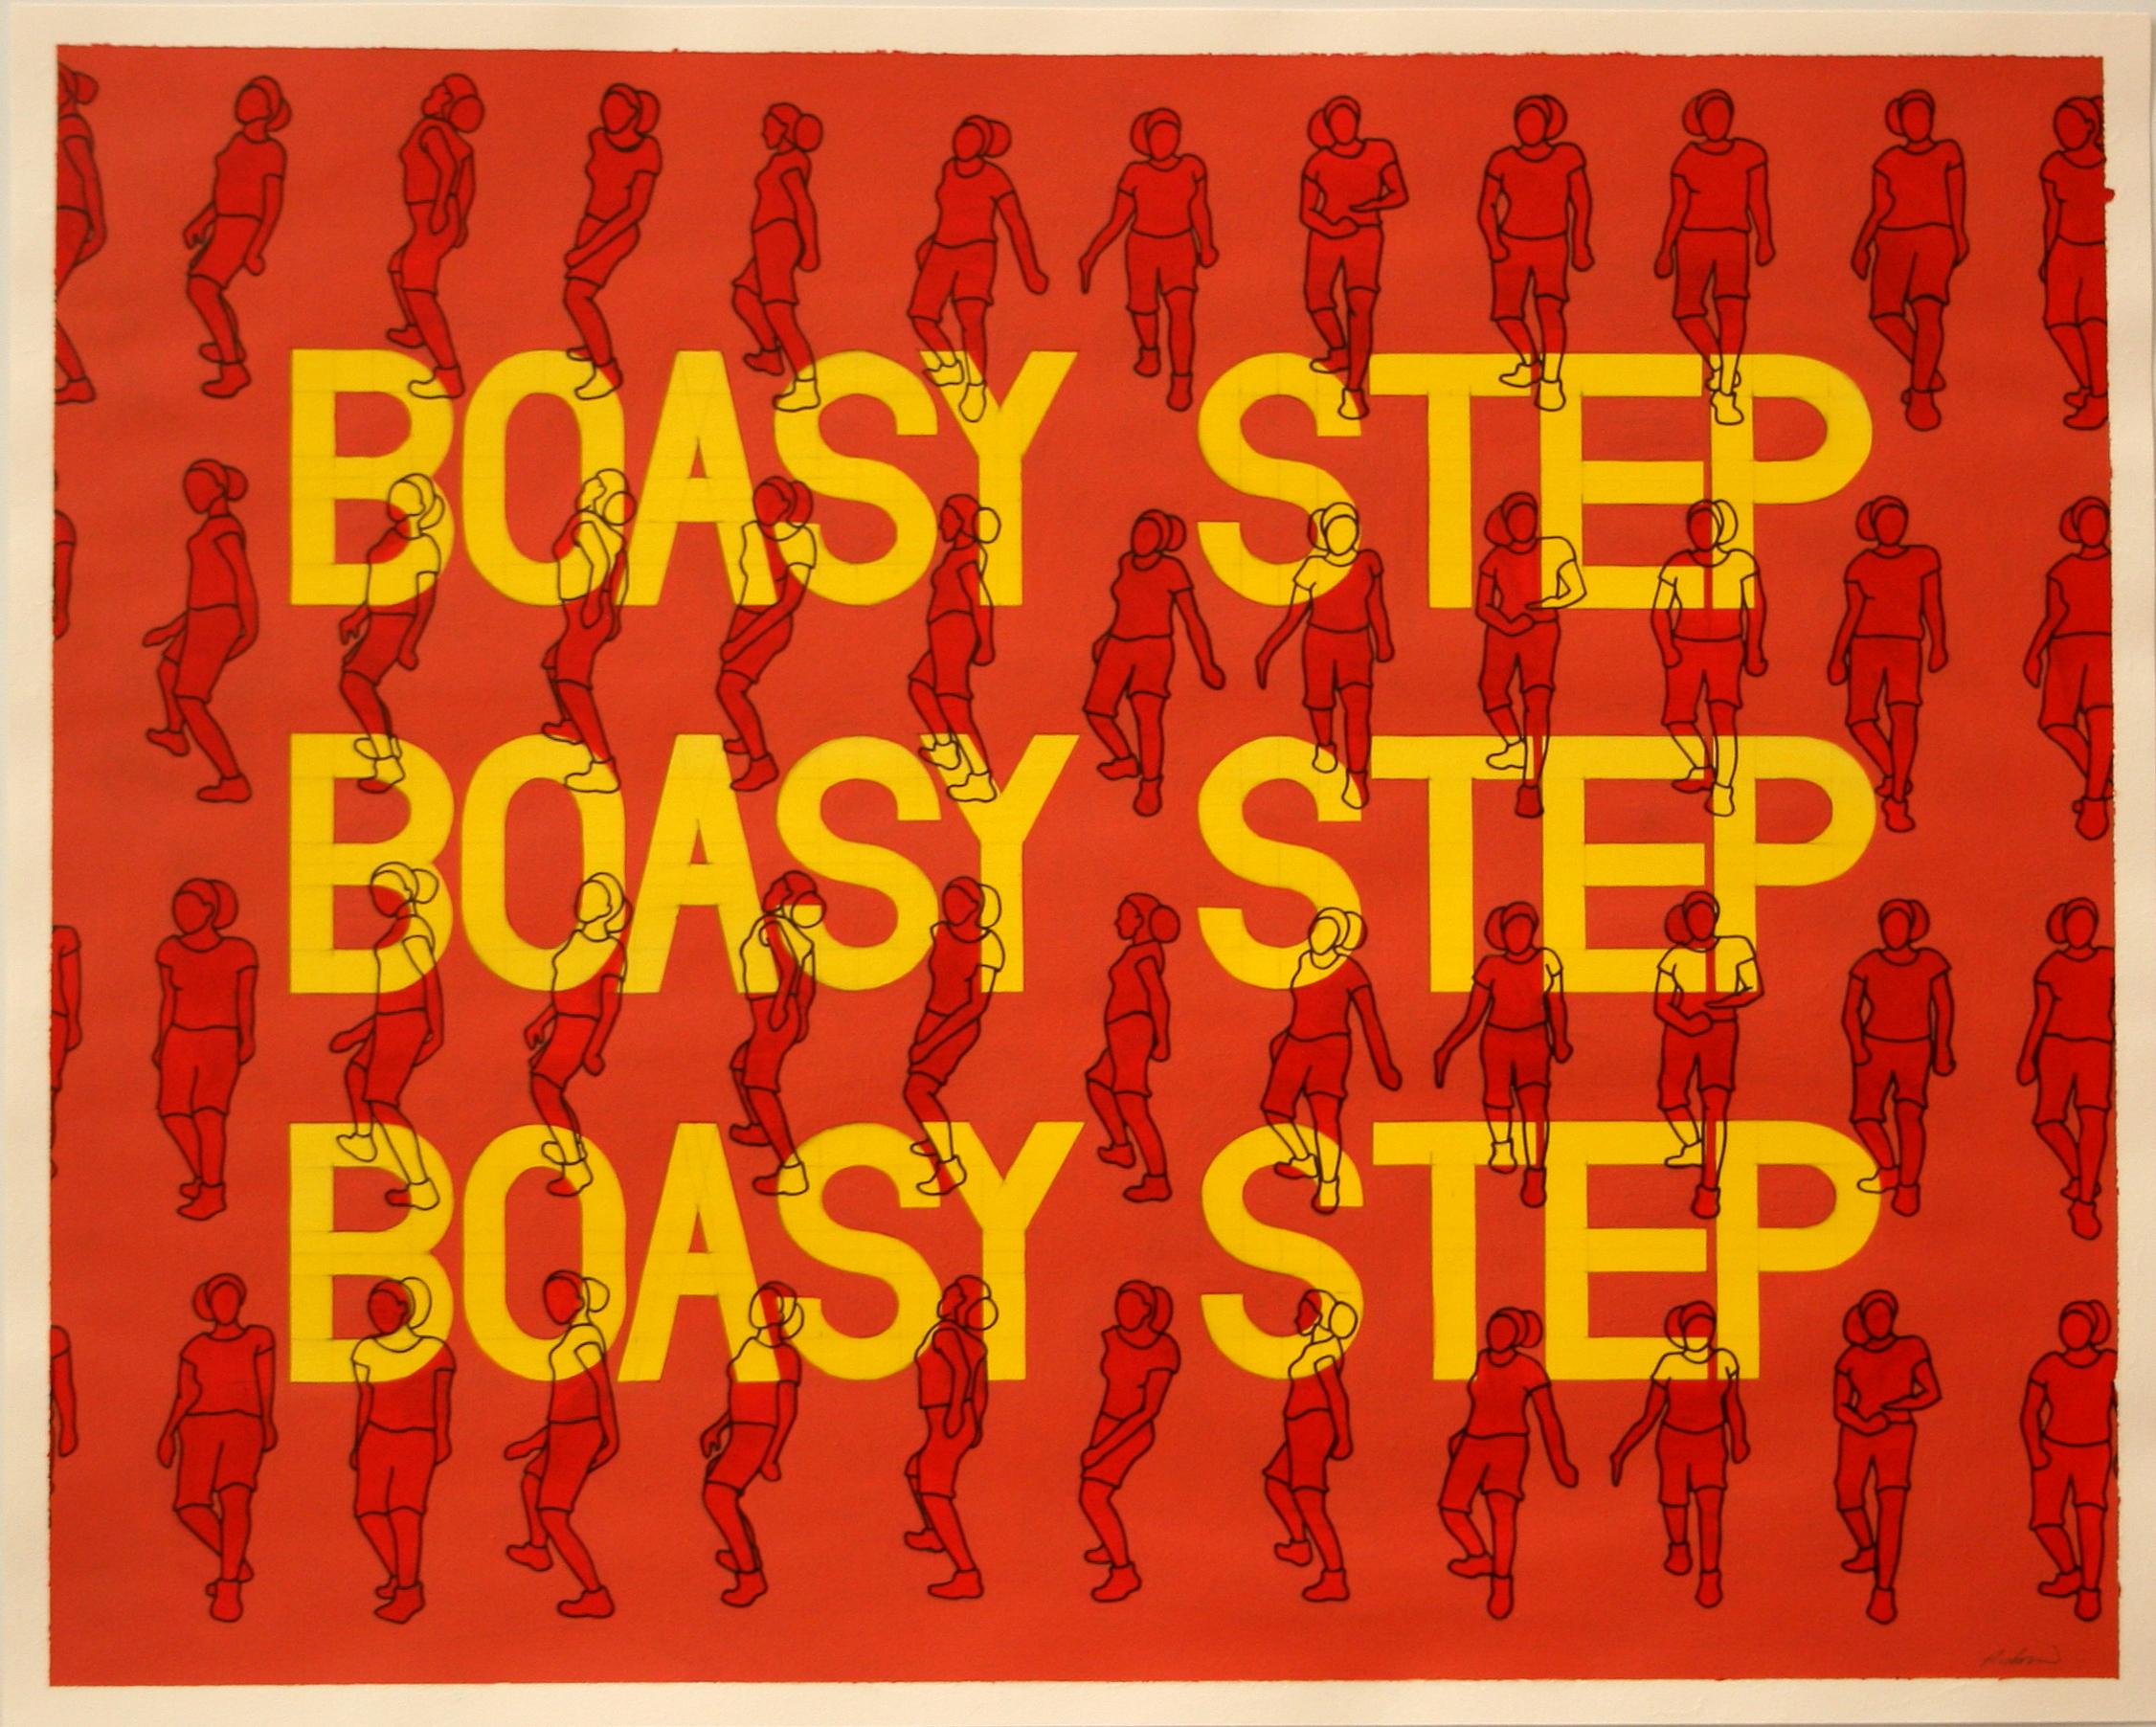 Boasy Step